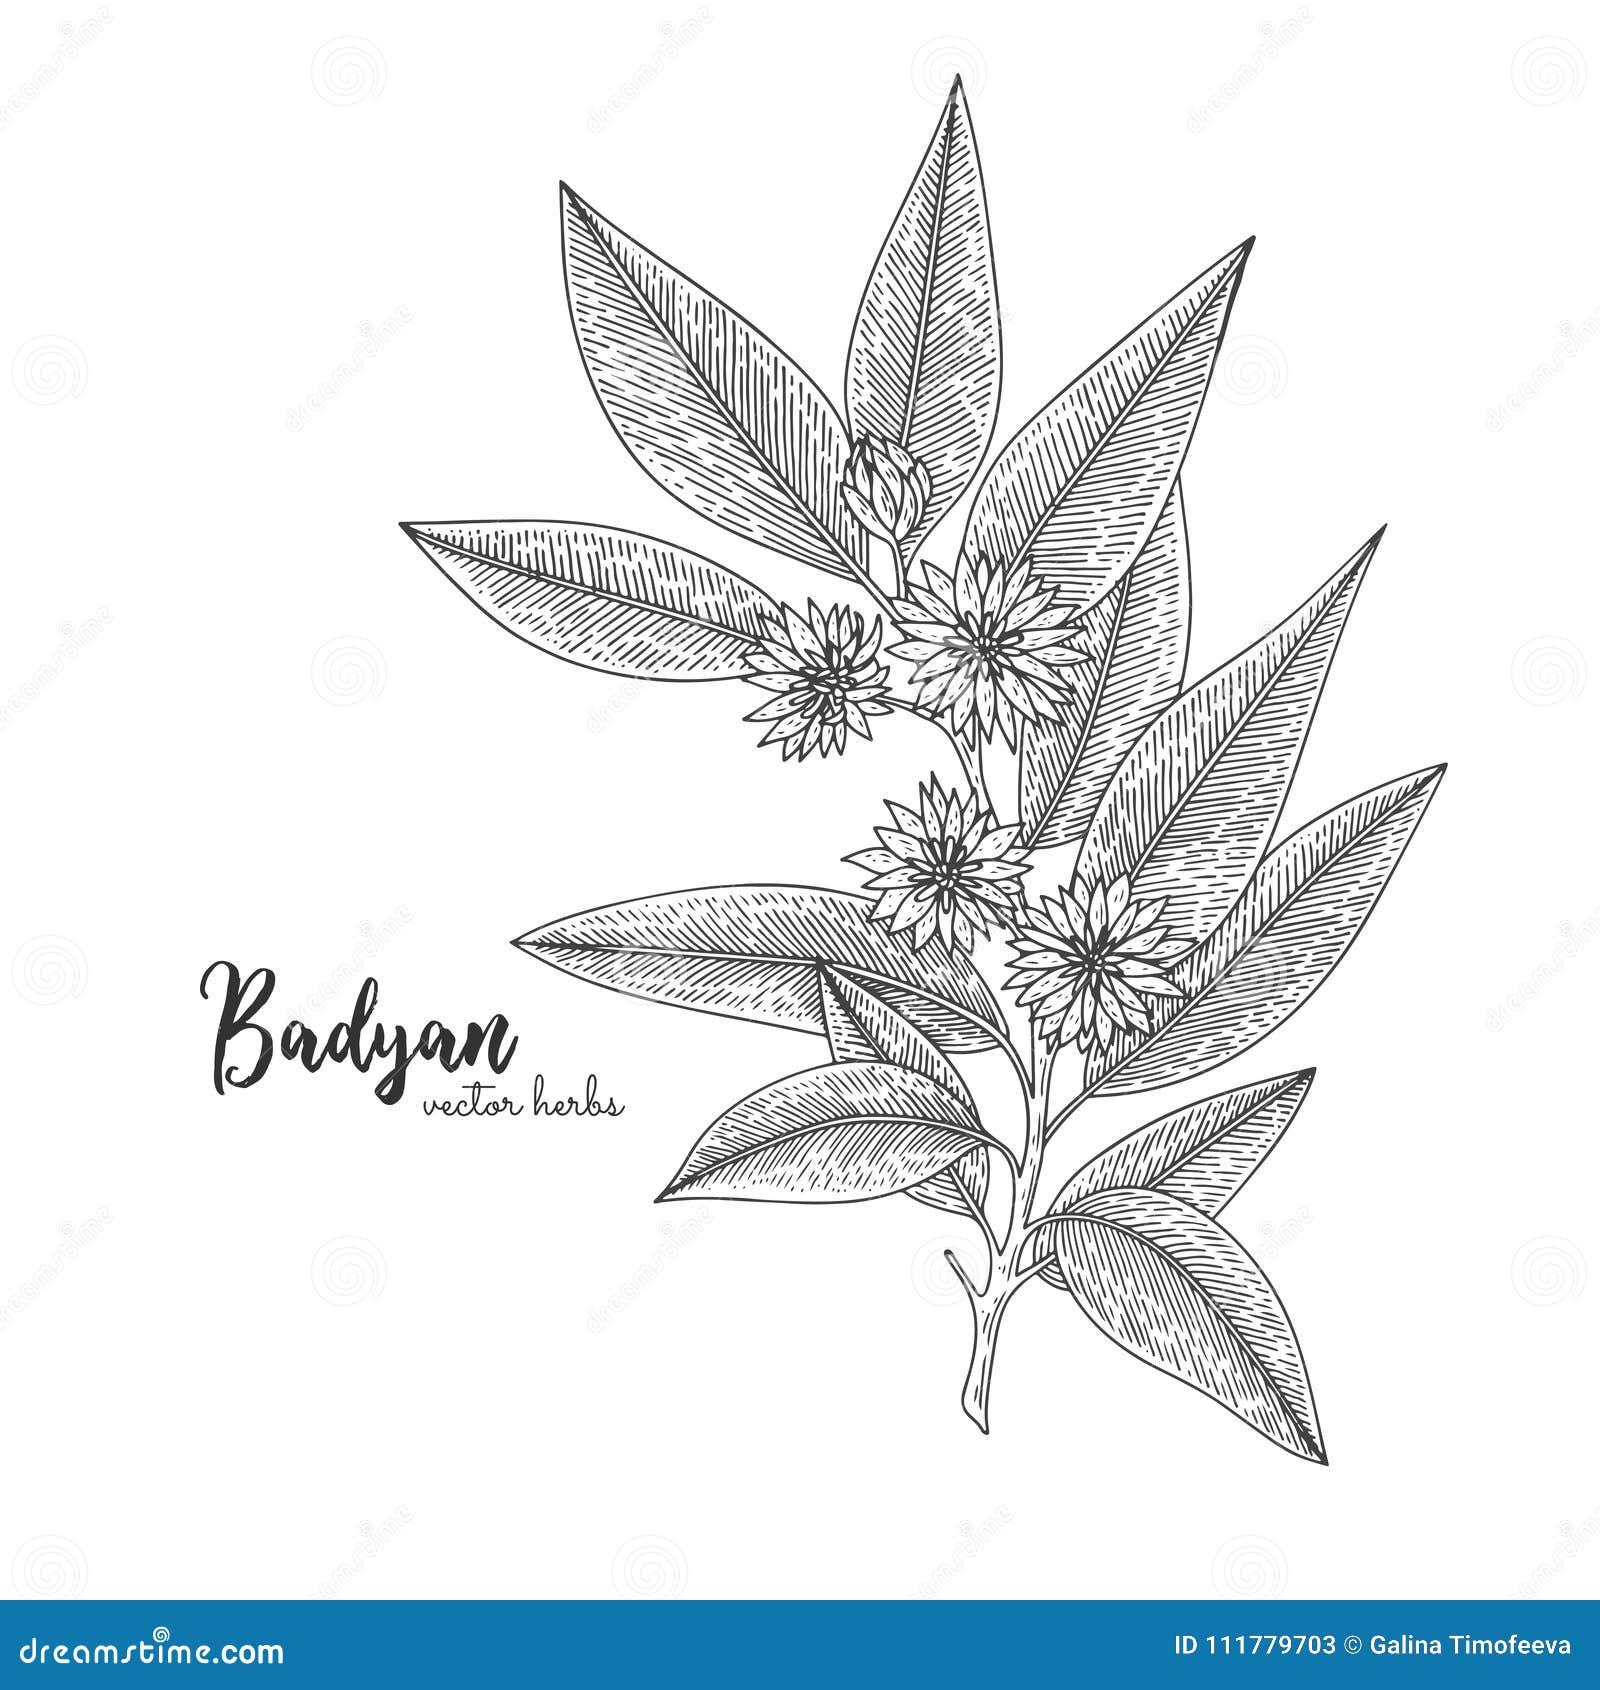 Badyan isolated on white background. Herbal engraved style illustration. Detailed organic product sketch. Botanical hand